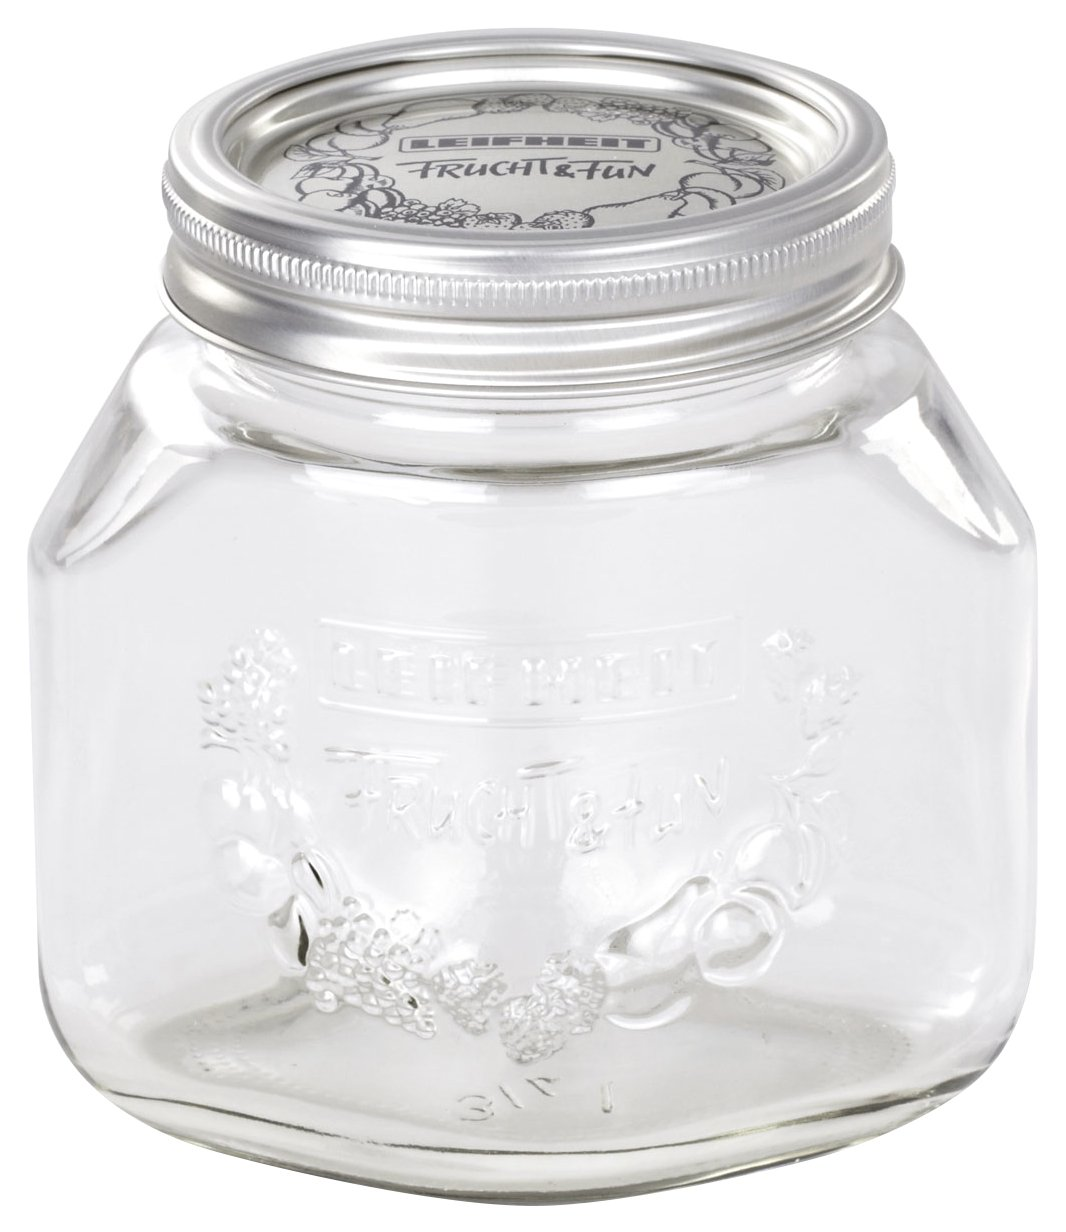 Leifheit 36203 3-Cup Preserve Jar, 3/4-Liter, Set of 6